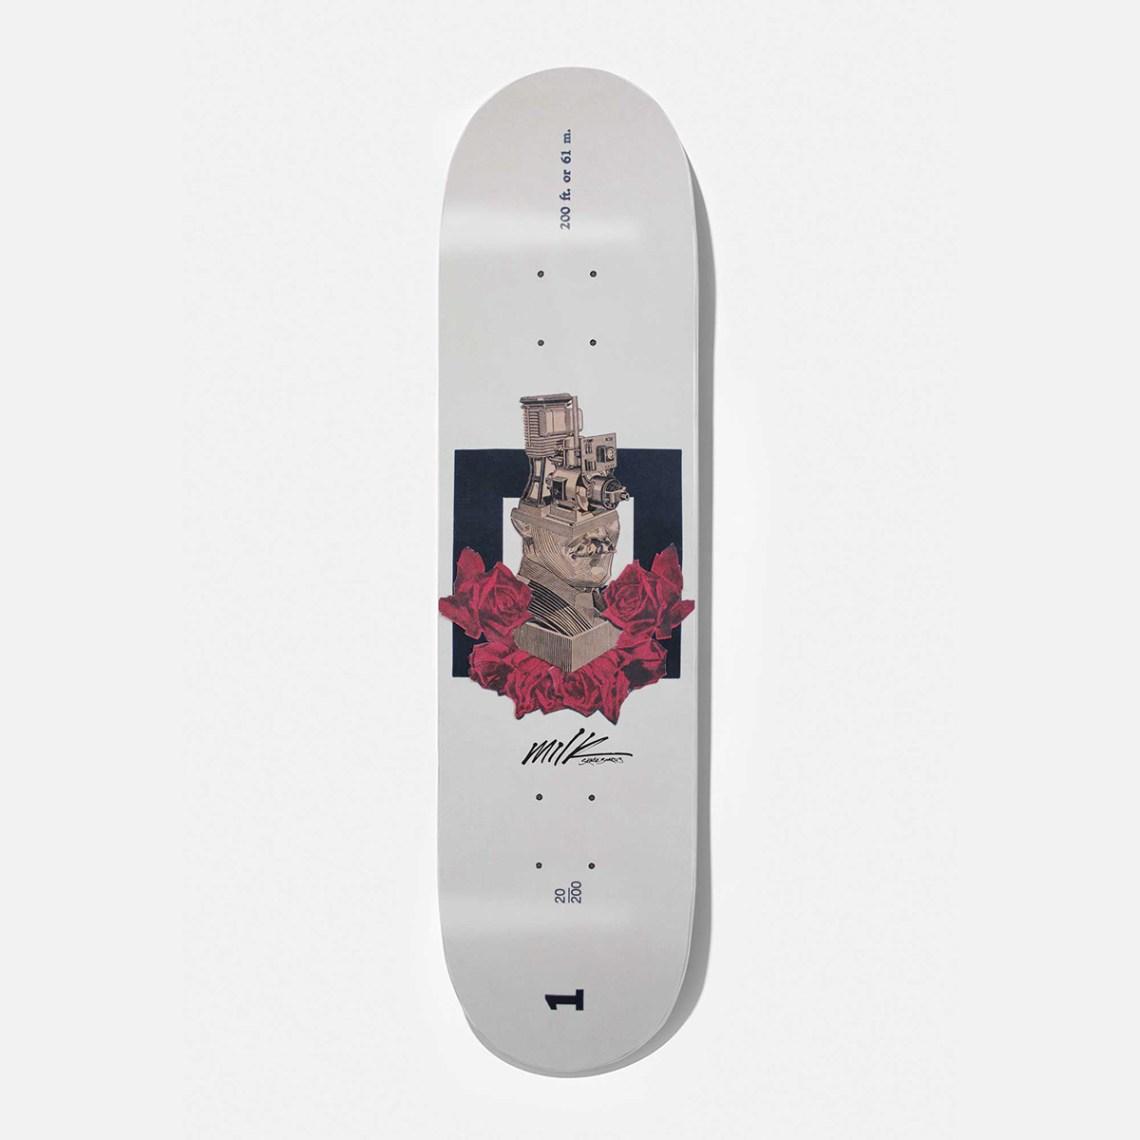 Beto Janz Milk Skateboards 7